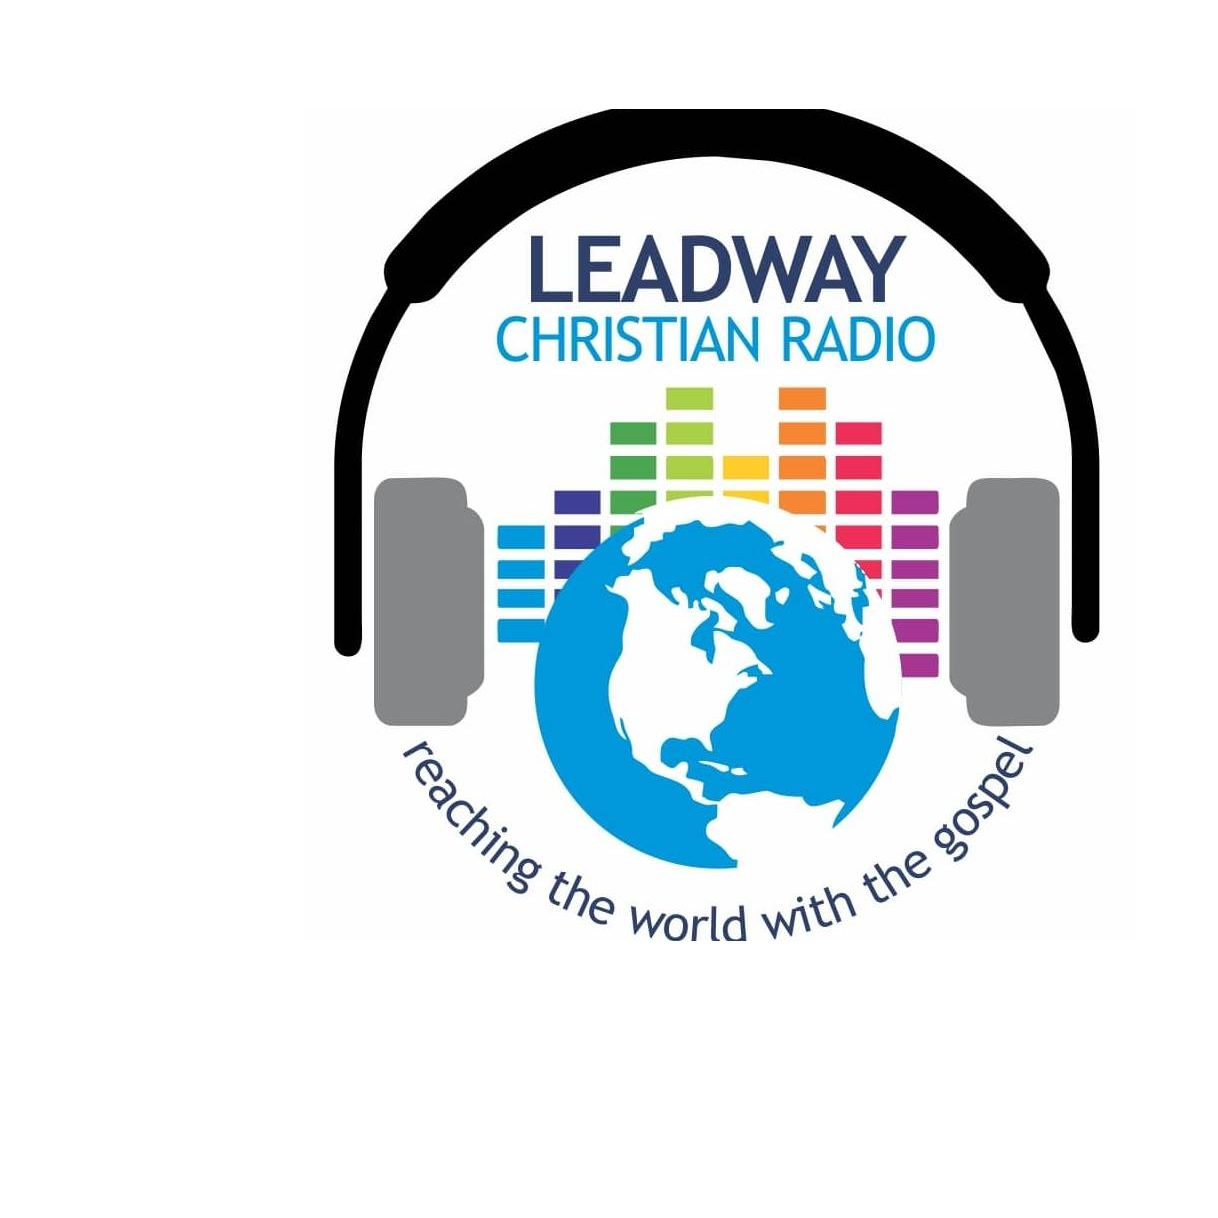 Leadway Christian Radio